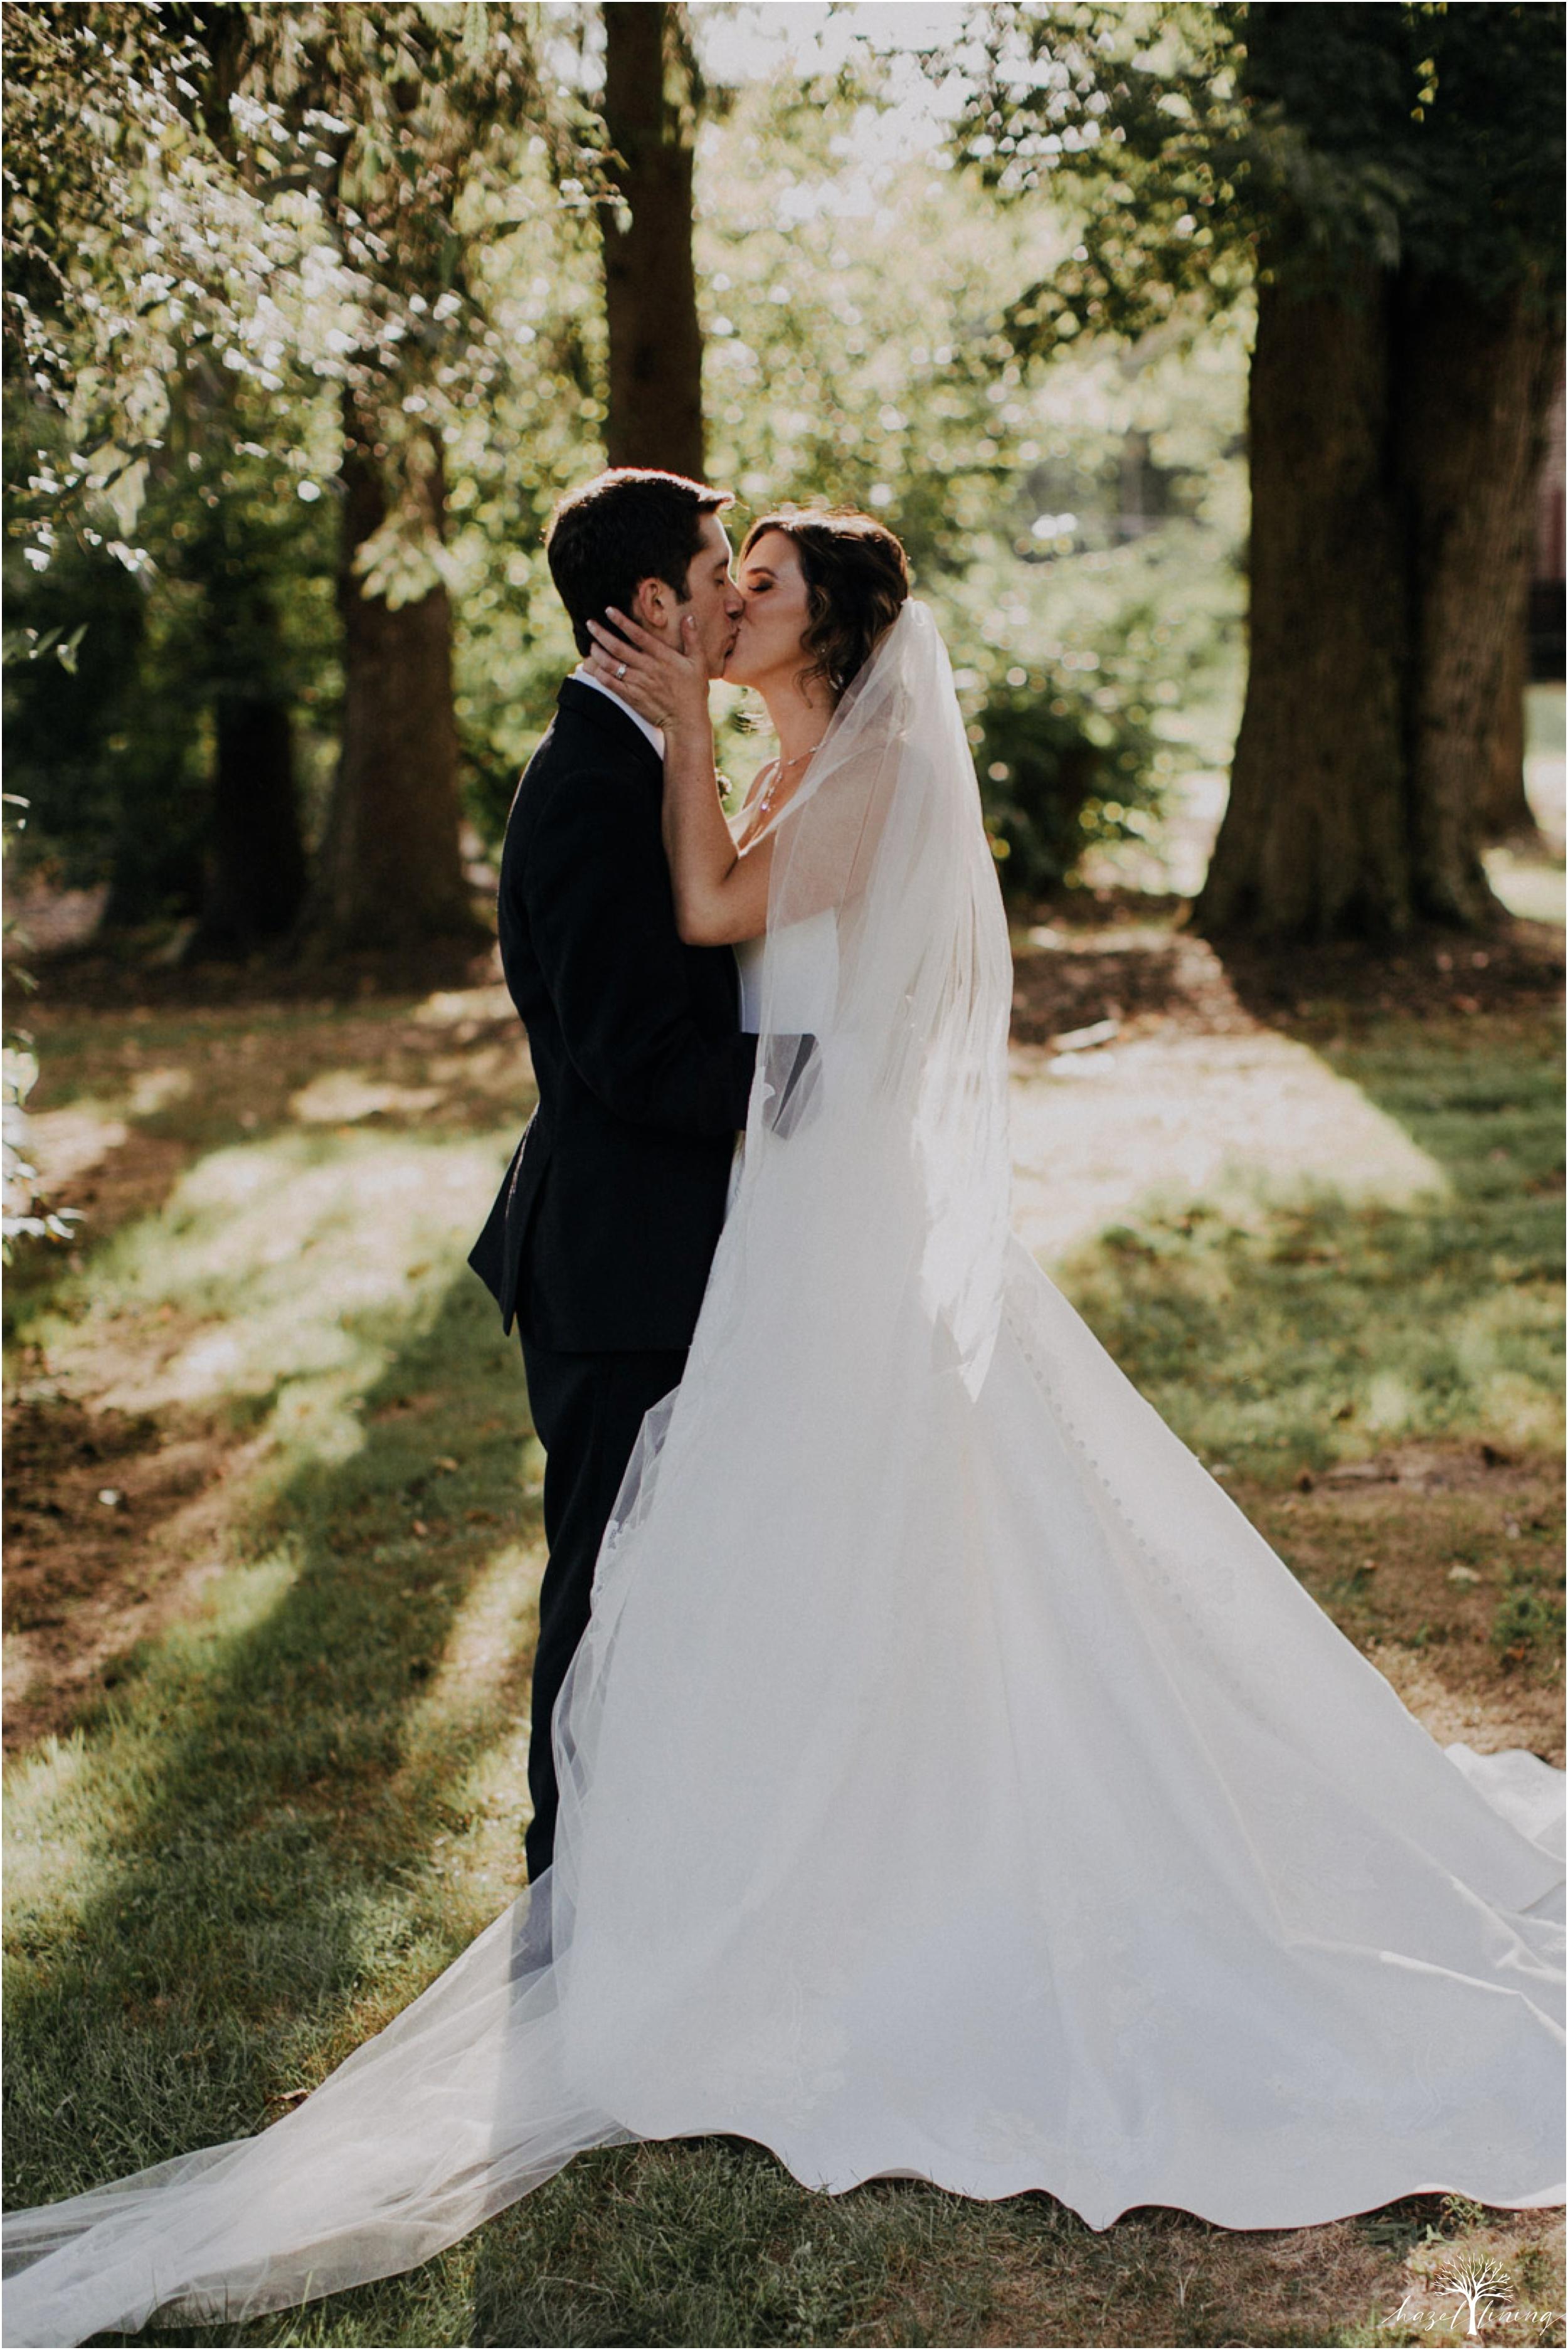 maureen-hepner-anthony-giordano-rose-bank-winery-newtow-pennsylvania-luxury-summer-wedding-hazel-lining-photography-destination-elopement-wedding-engagement-photography_0122.jpg